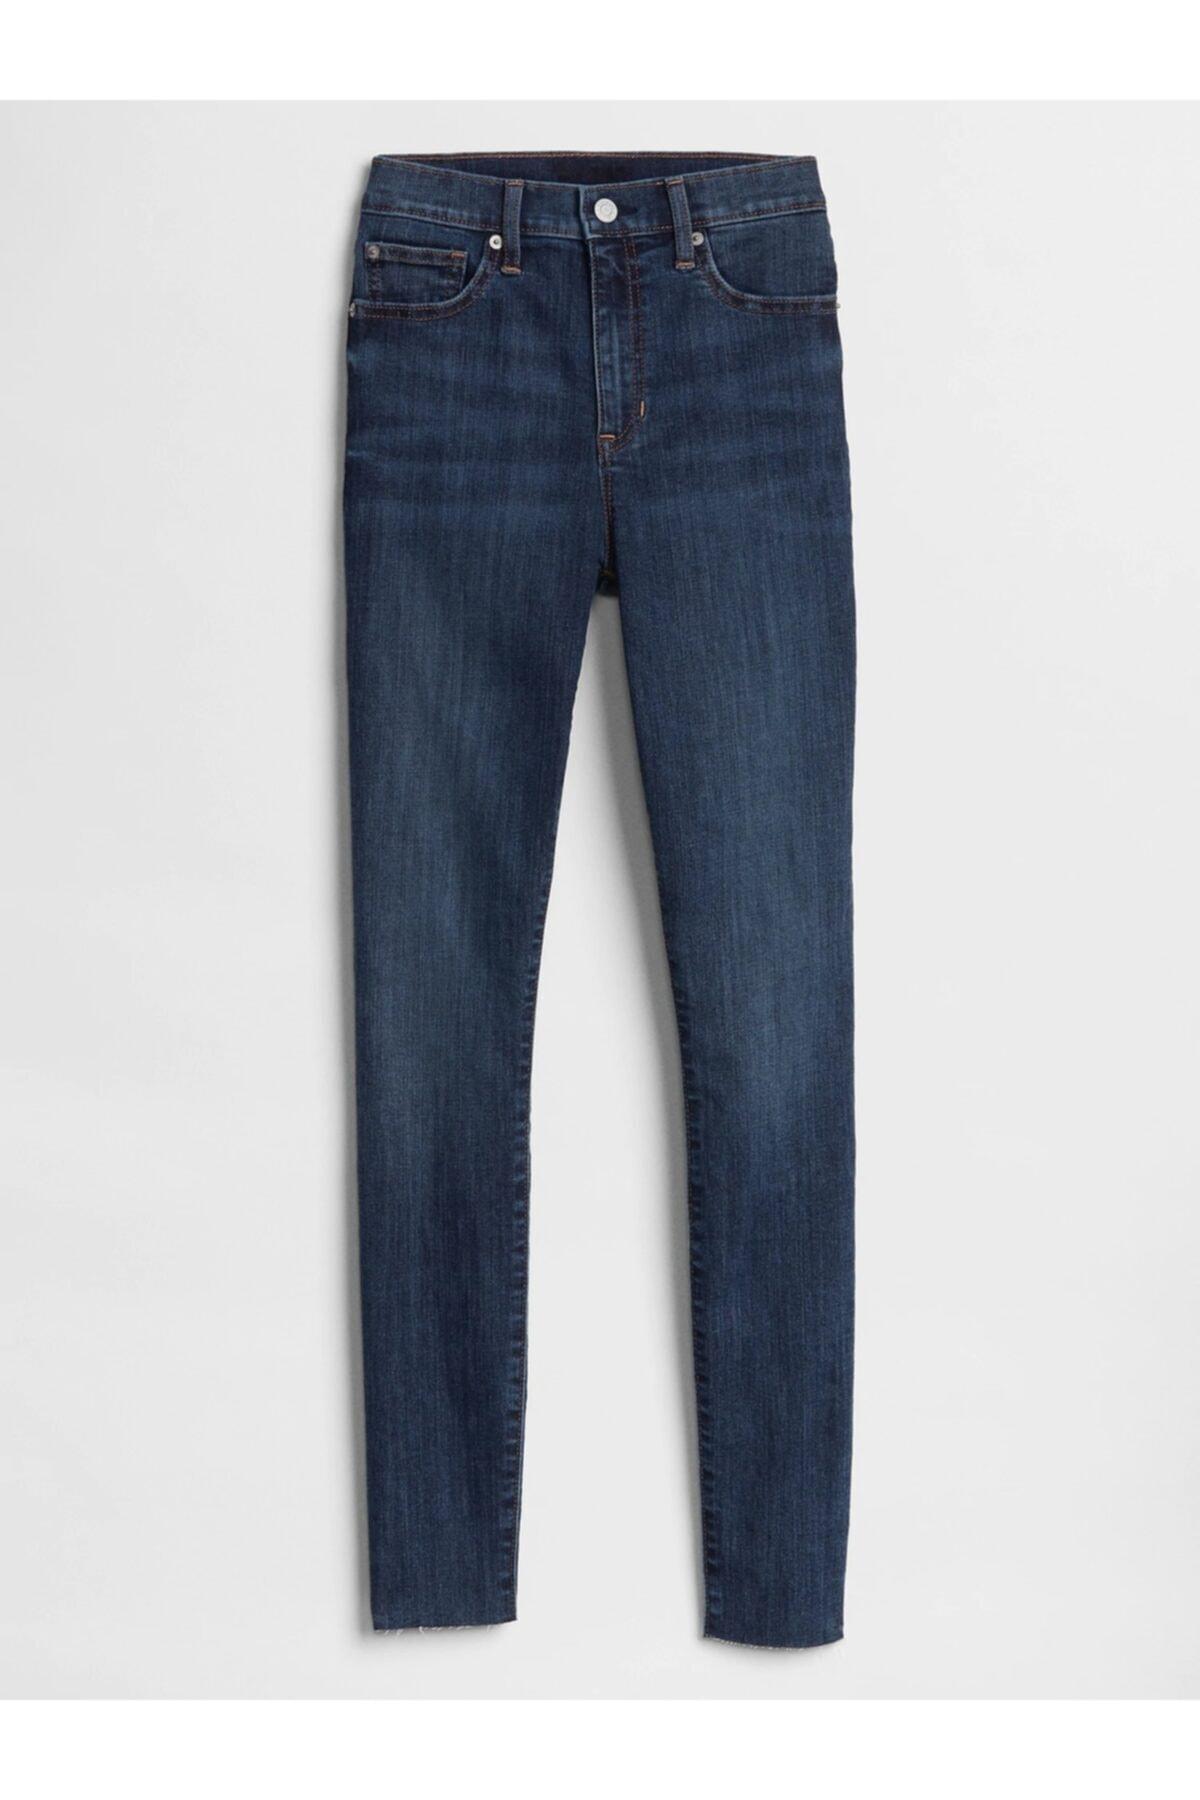 GAP High Rise Legging Jean Pantolon